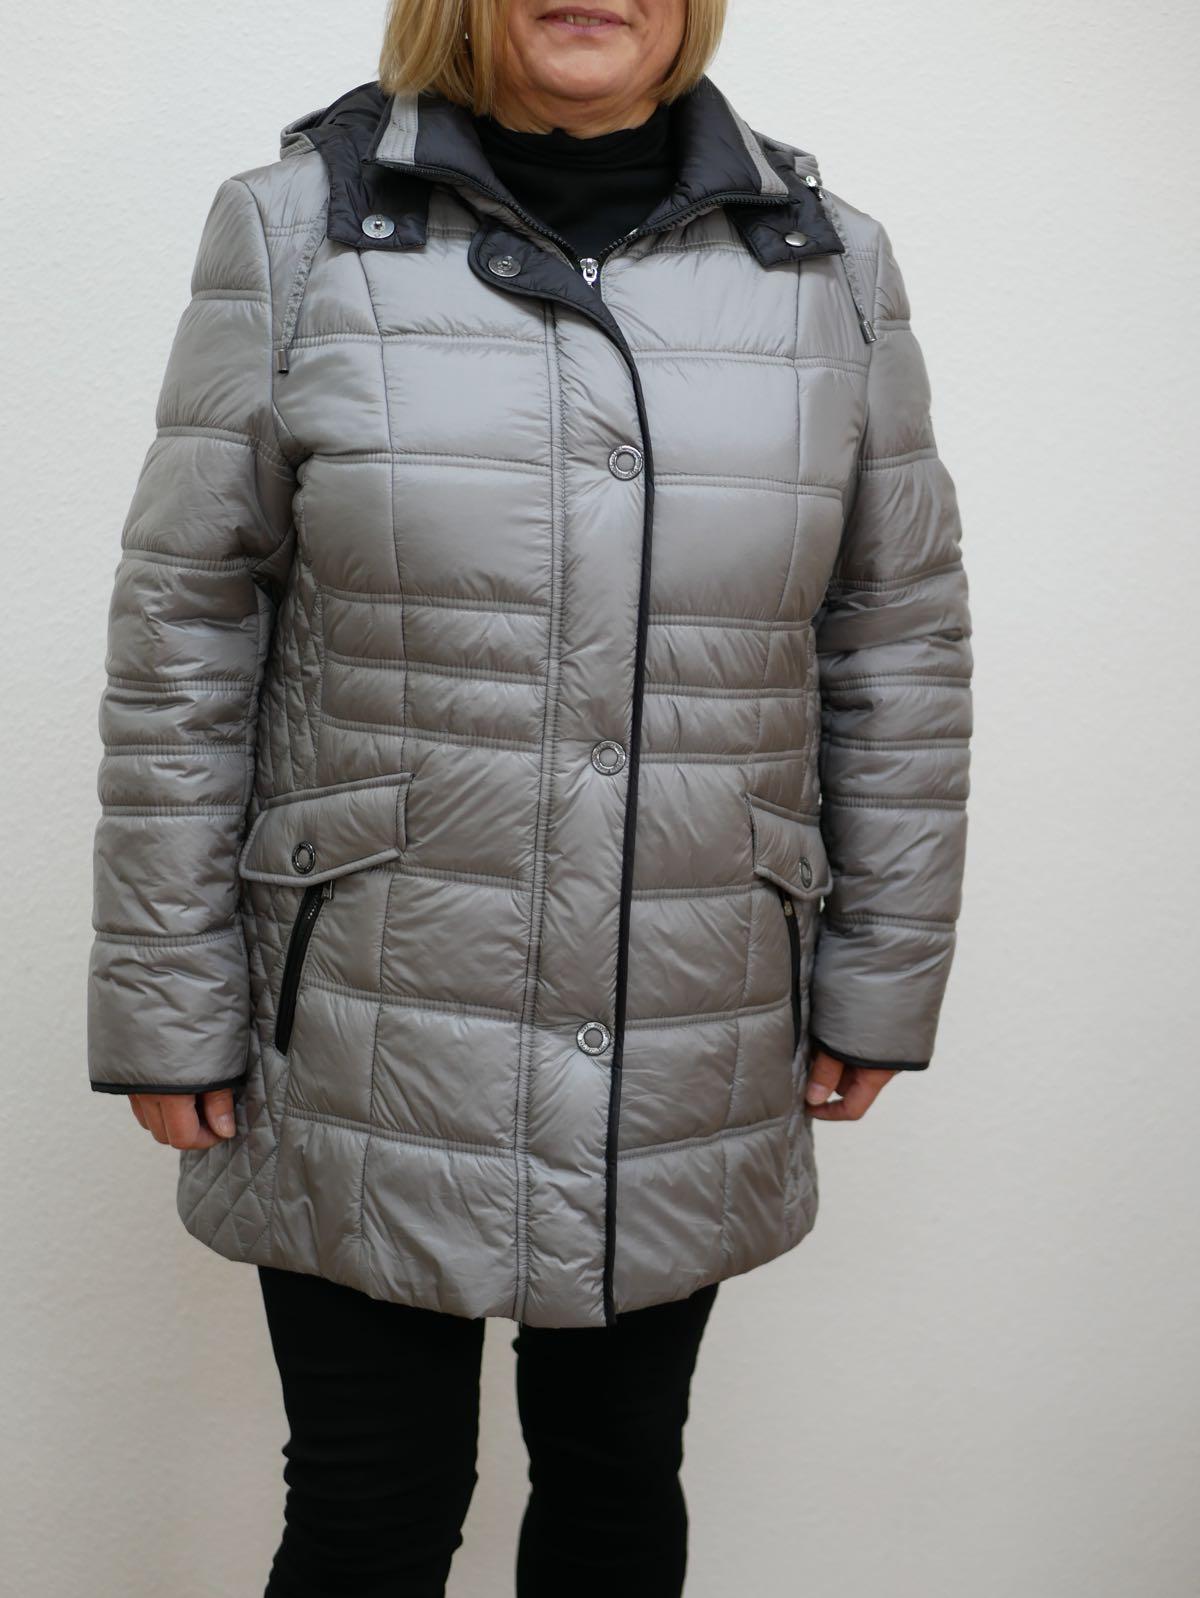 Damen Winterjacke Lebek silber 1